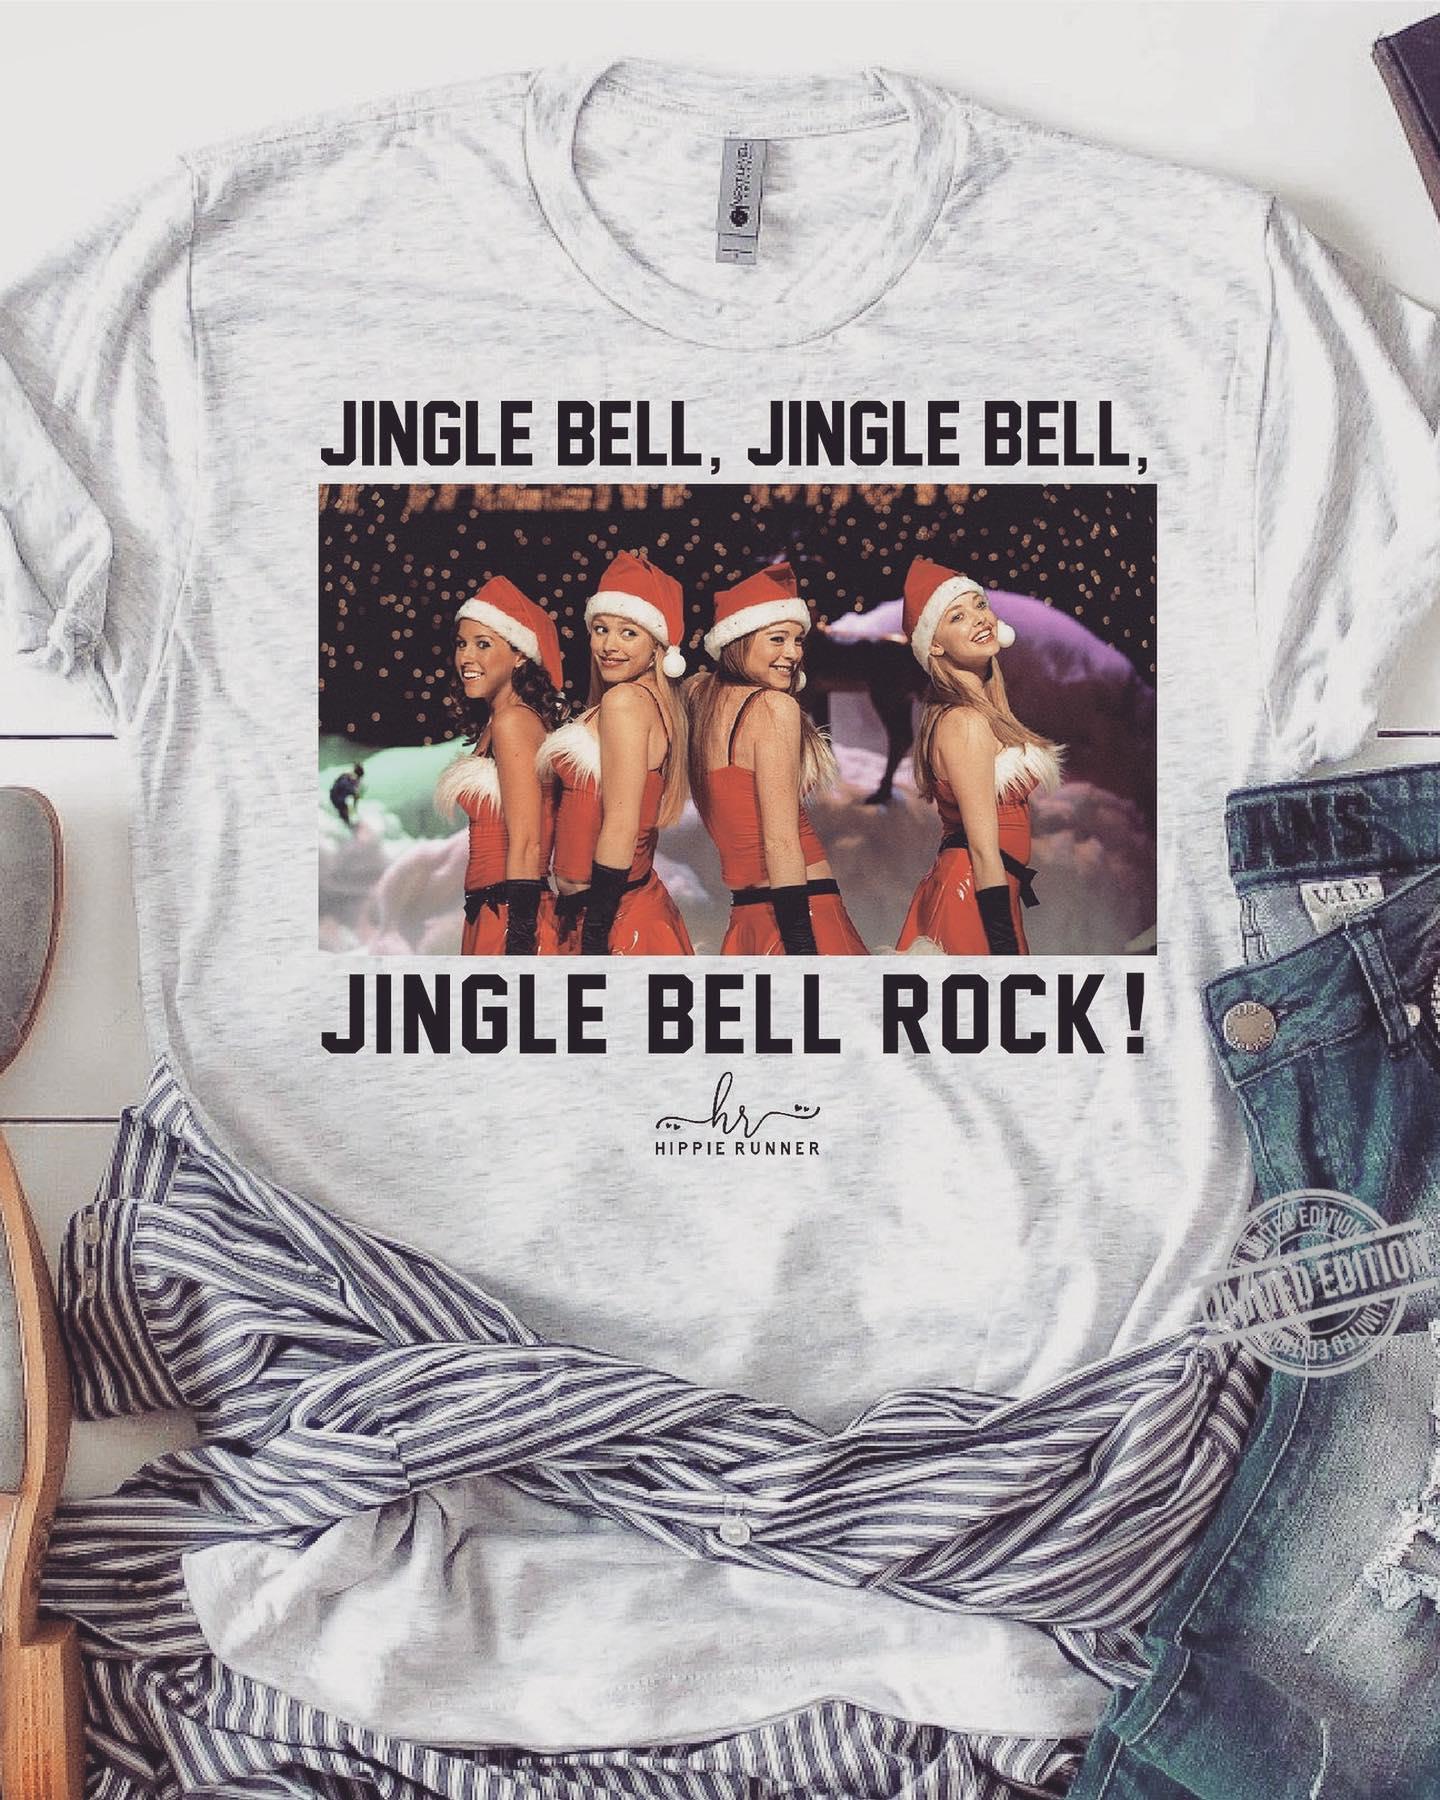 Jingle Bell Jingle Bell Jingle Bell Rock Women T-Shirt